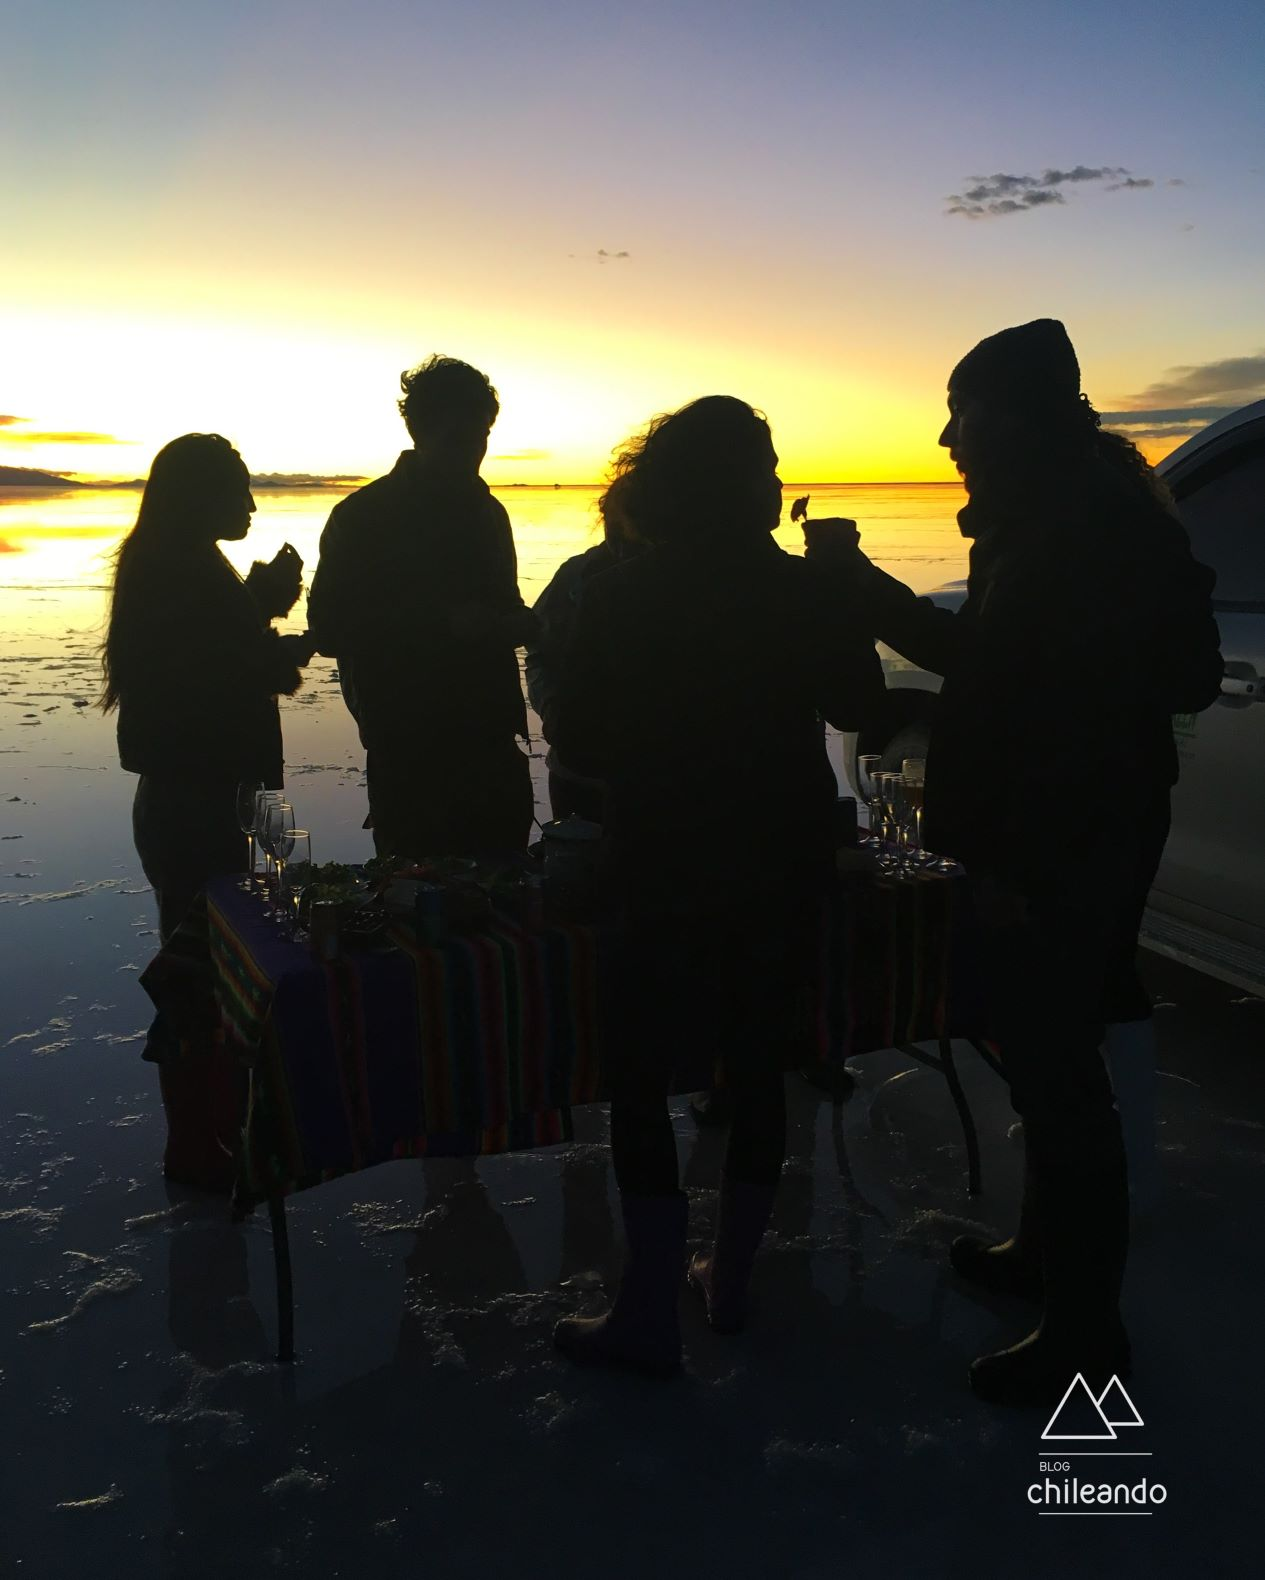 Coquetel ao pôr do sol no meio do salar de Uyuni